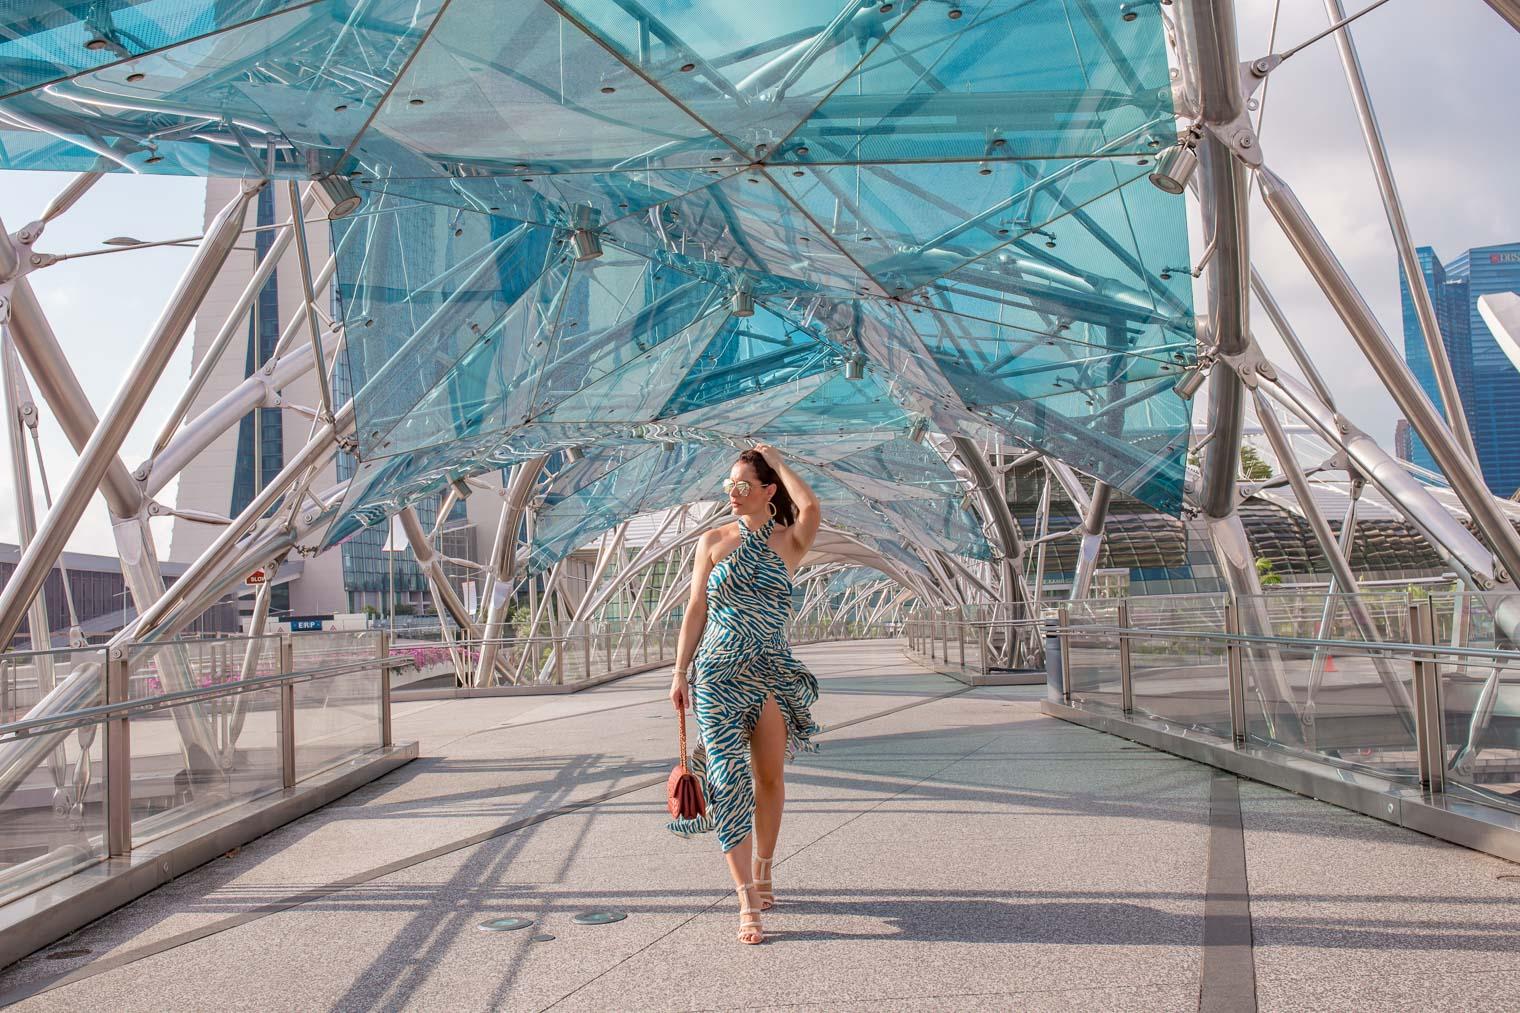 Helix bridge Singapore Marina Bay Sands